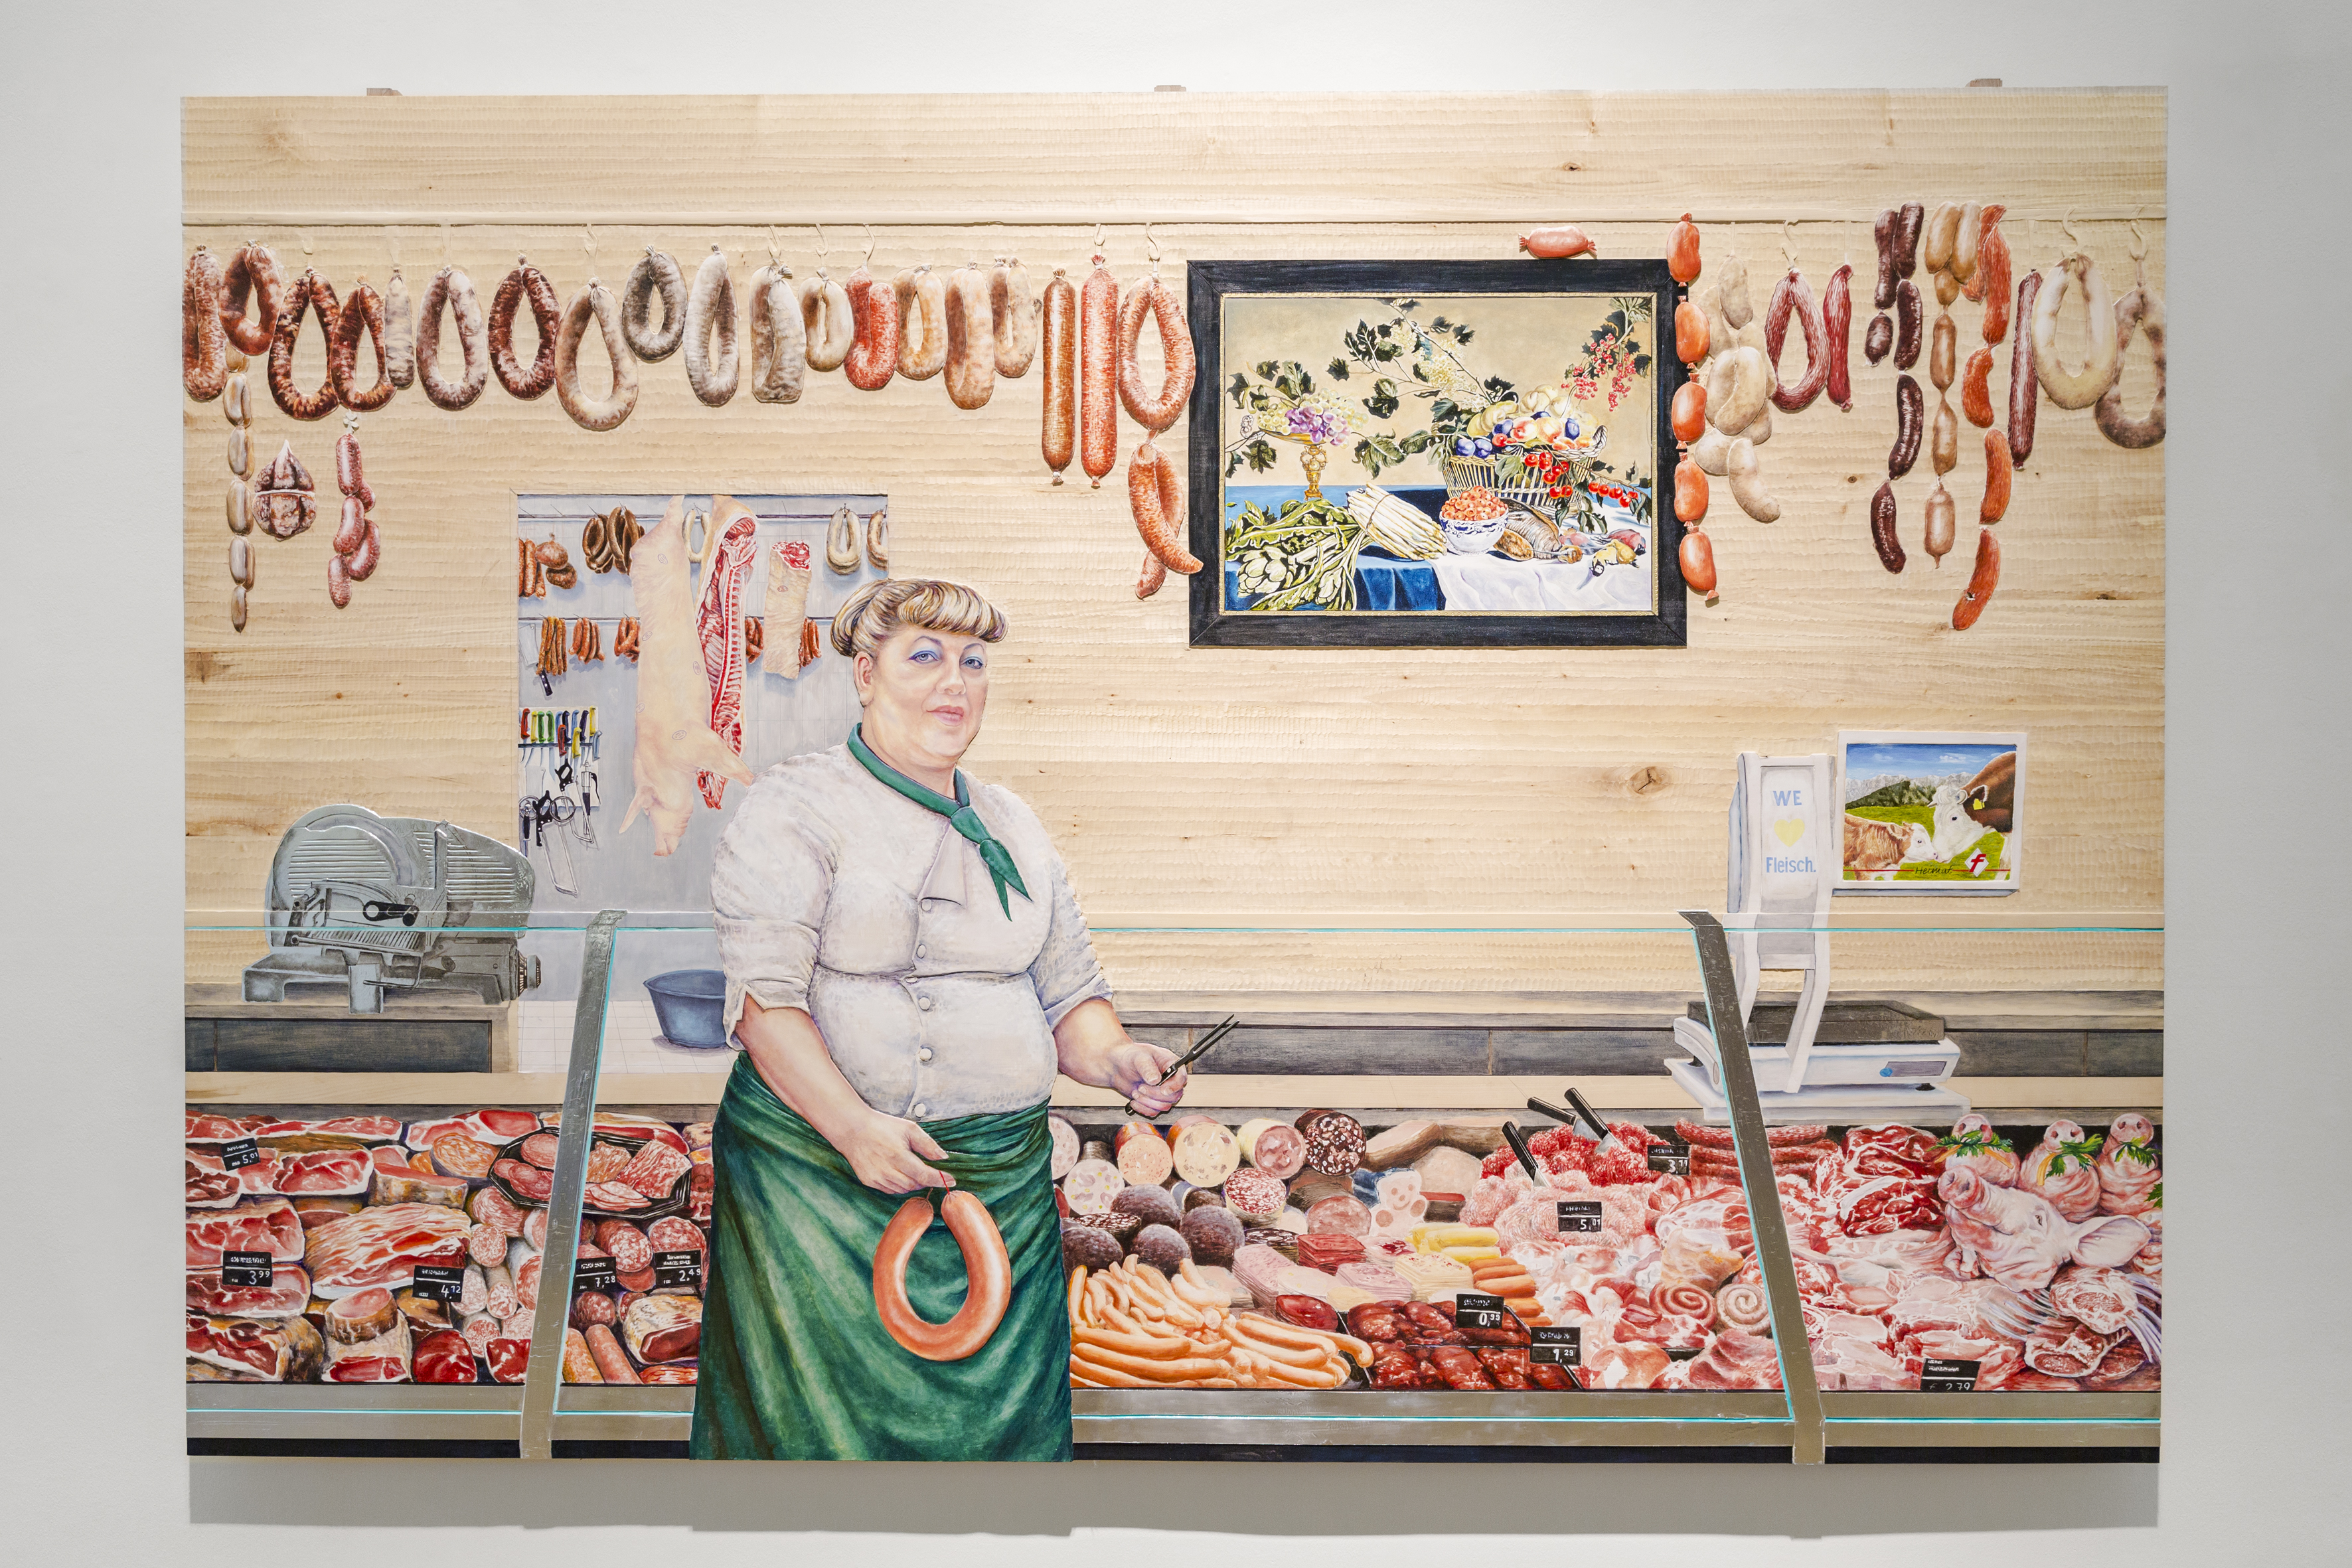 Metzgerin – Butcher